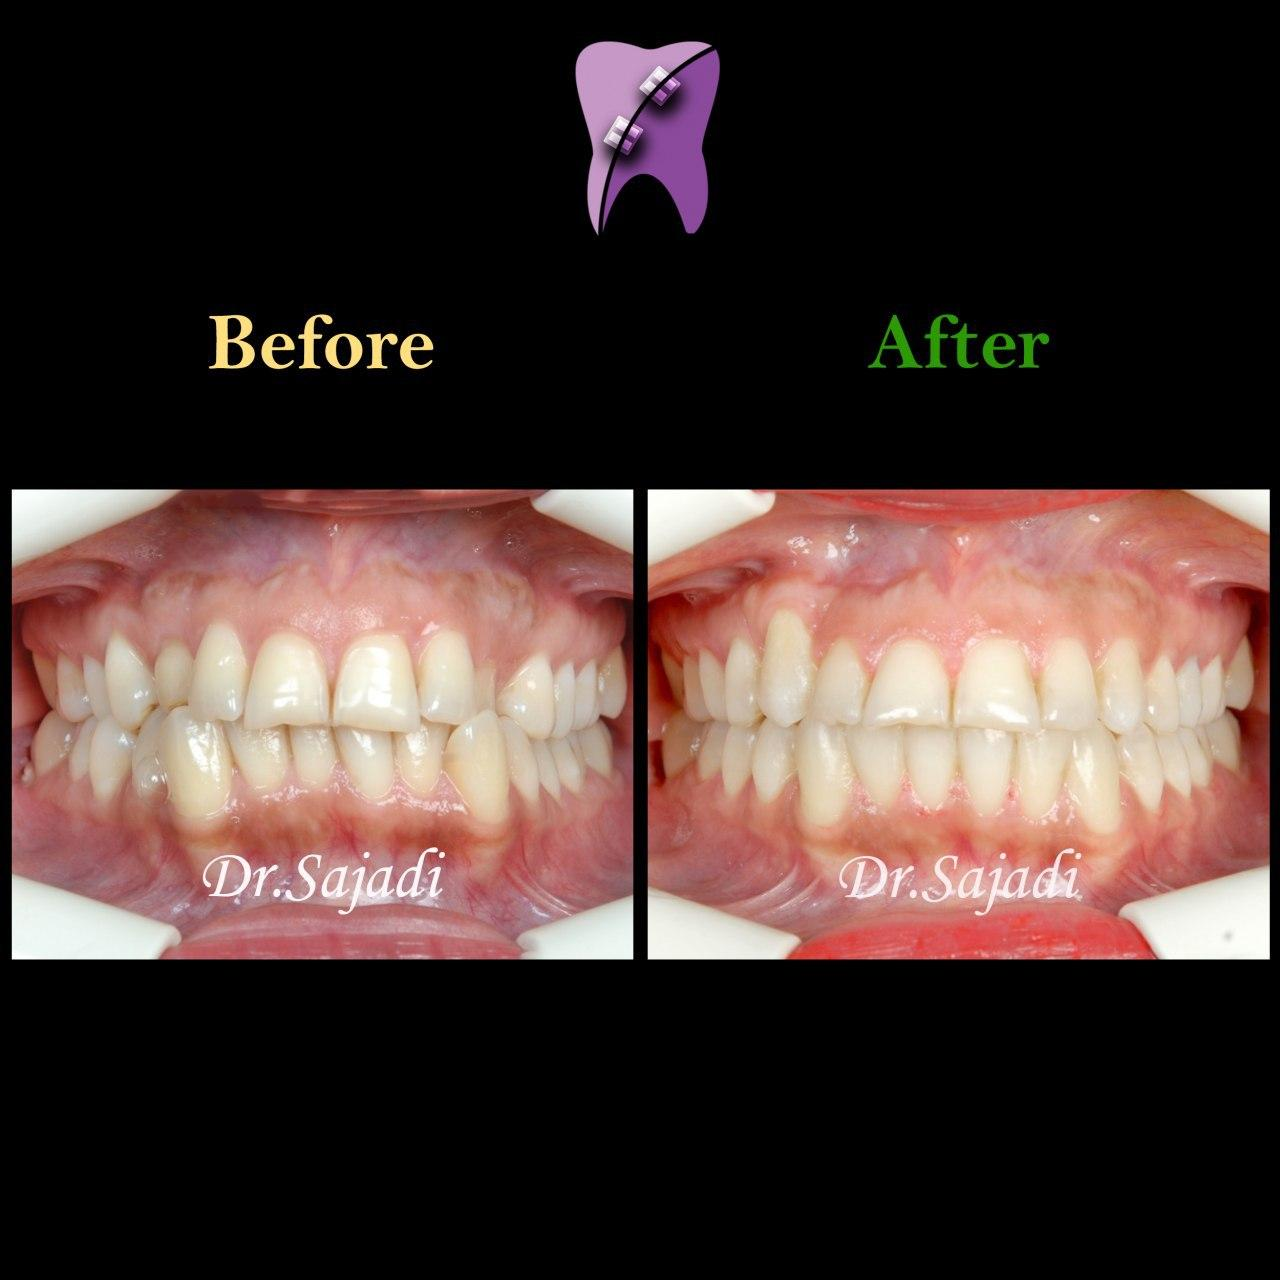 photo 2020 01 13 10 44 02 - درمان ارتودنسي بيمار با رفع بي نظمي دندان